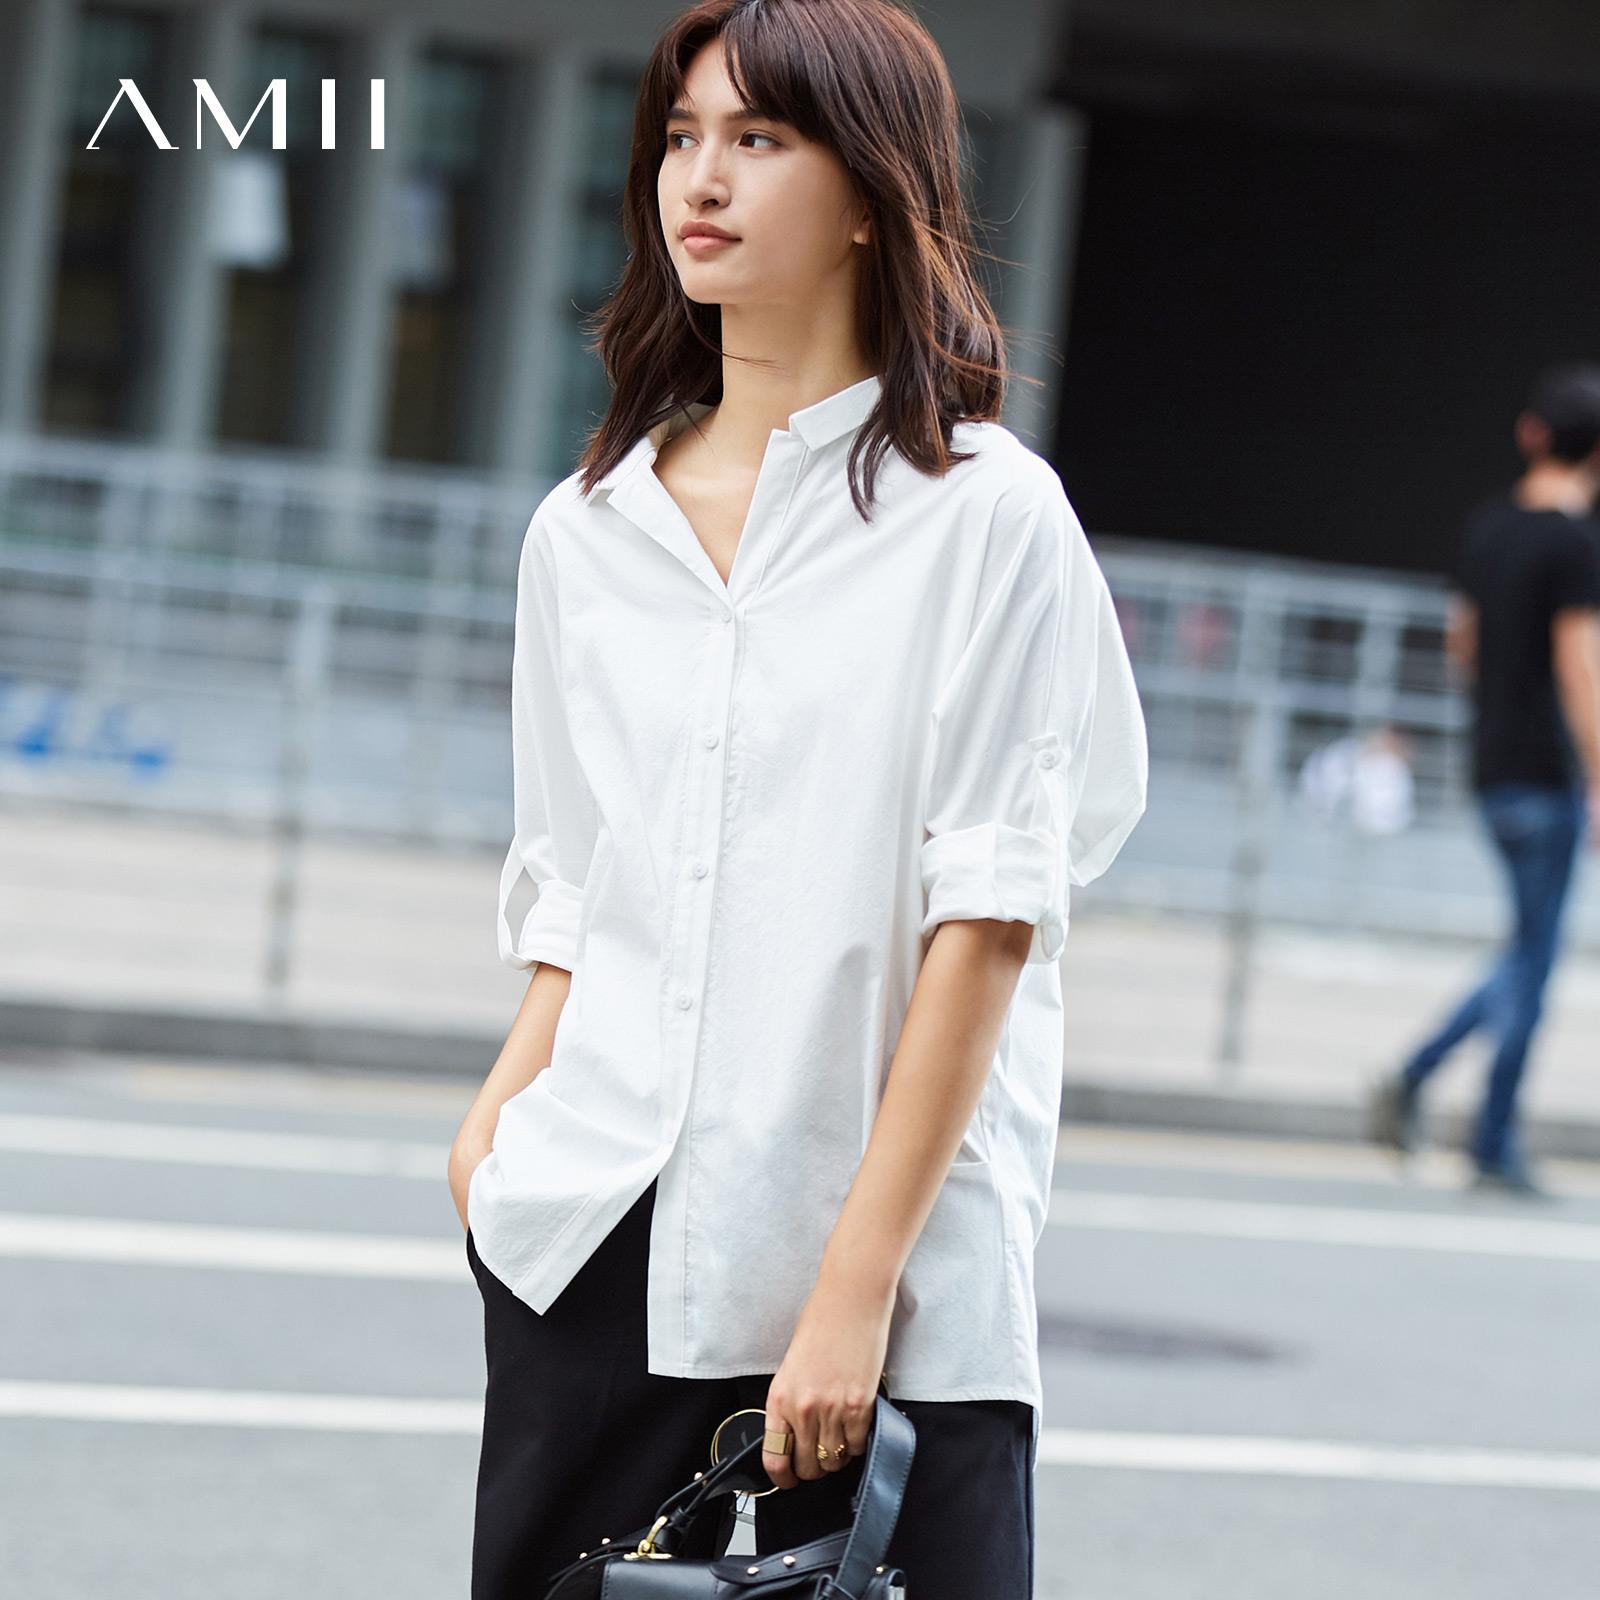 +Amii[极简主义]帅气有型 纯棉BF风衬衫女2017秋新款连肩长袖上衣